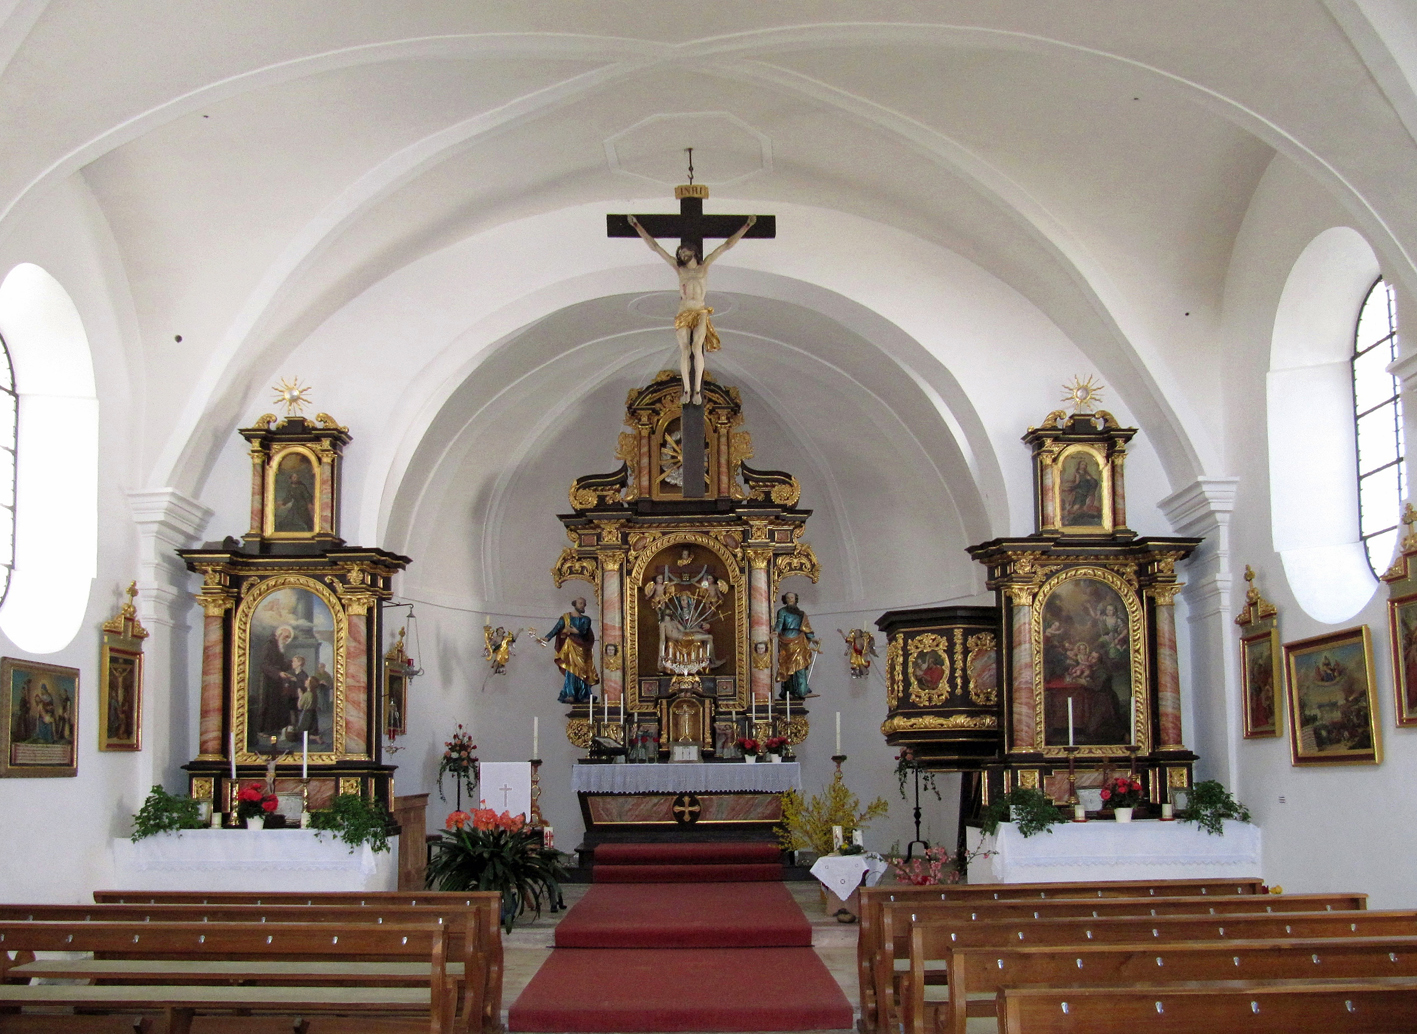 2021 04 26 aoelfb wallfahrtskirche mariae himmelfahrt atzberg1